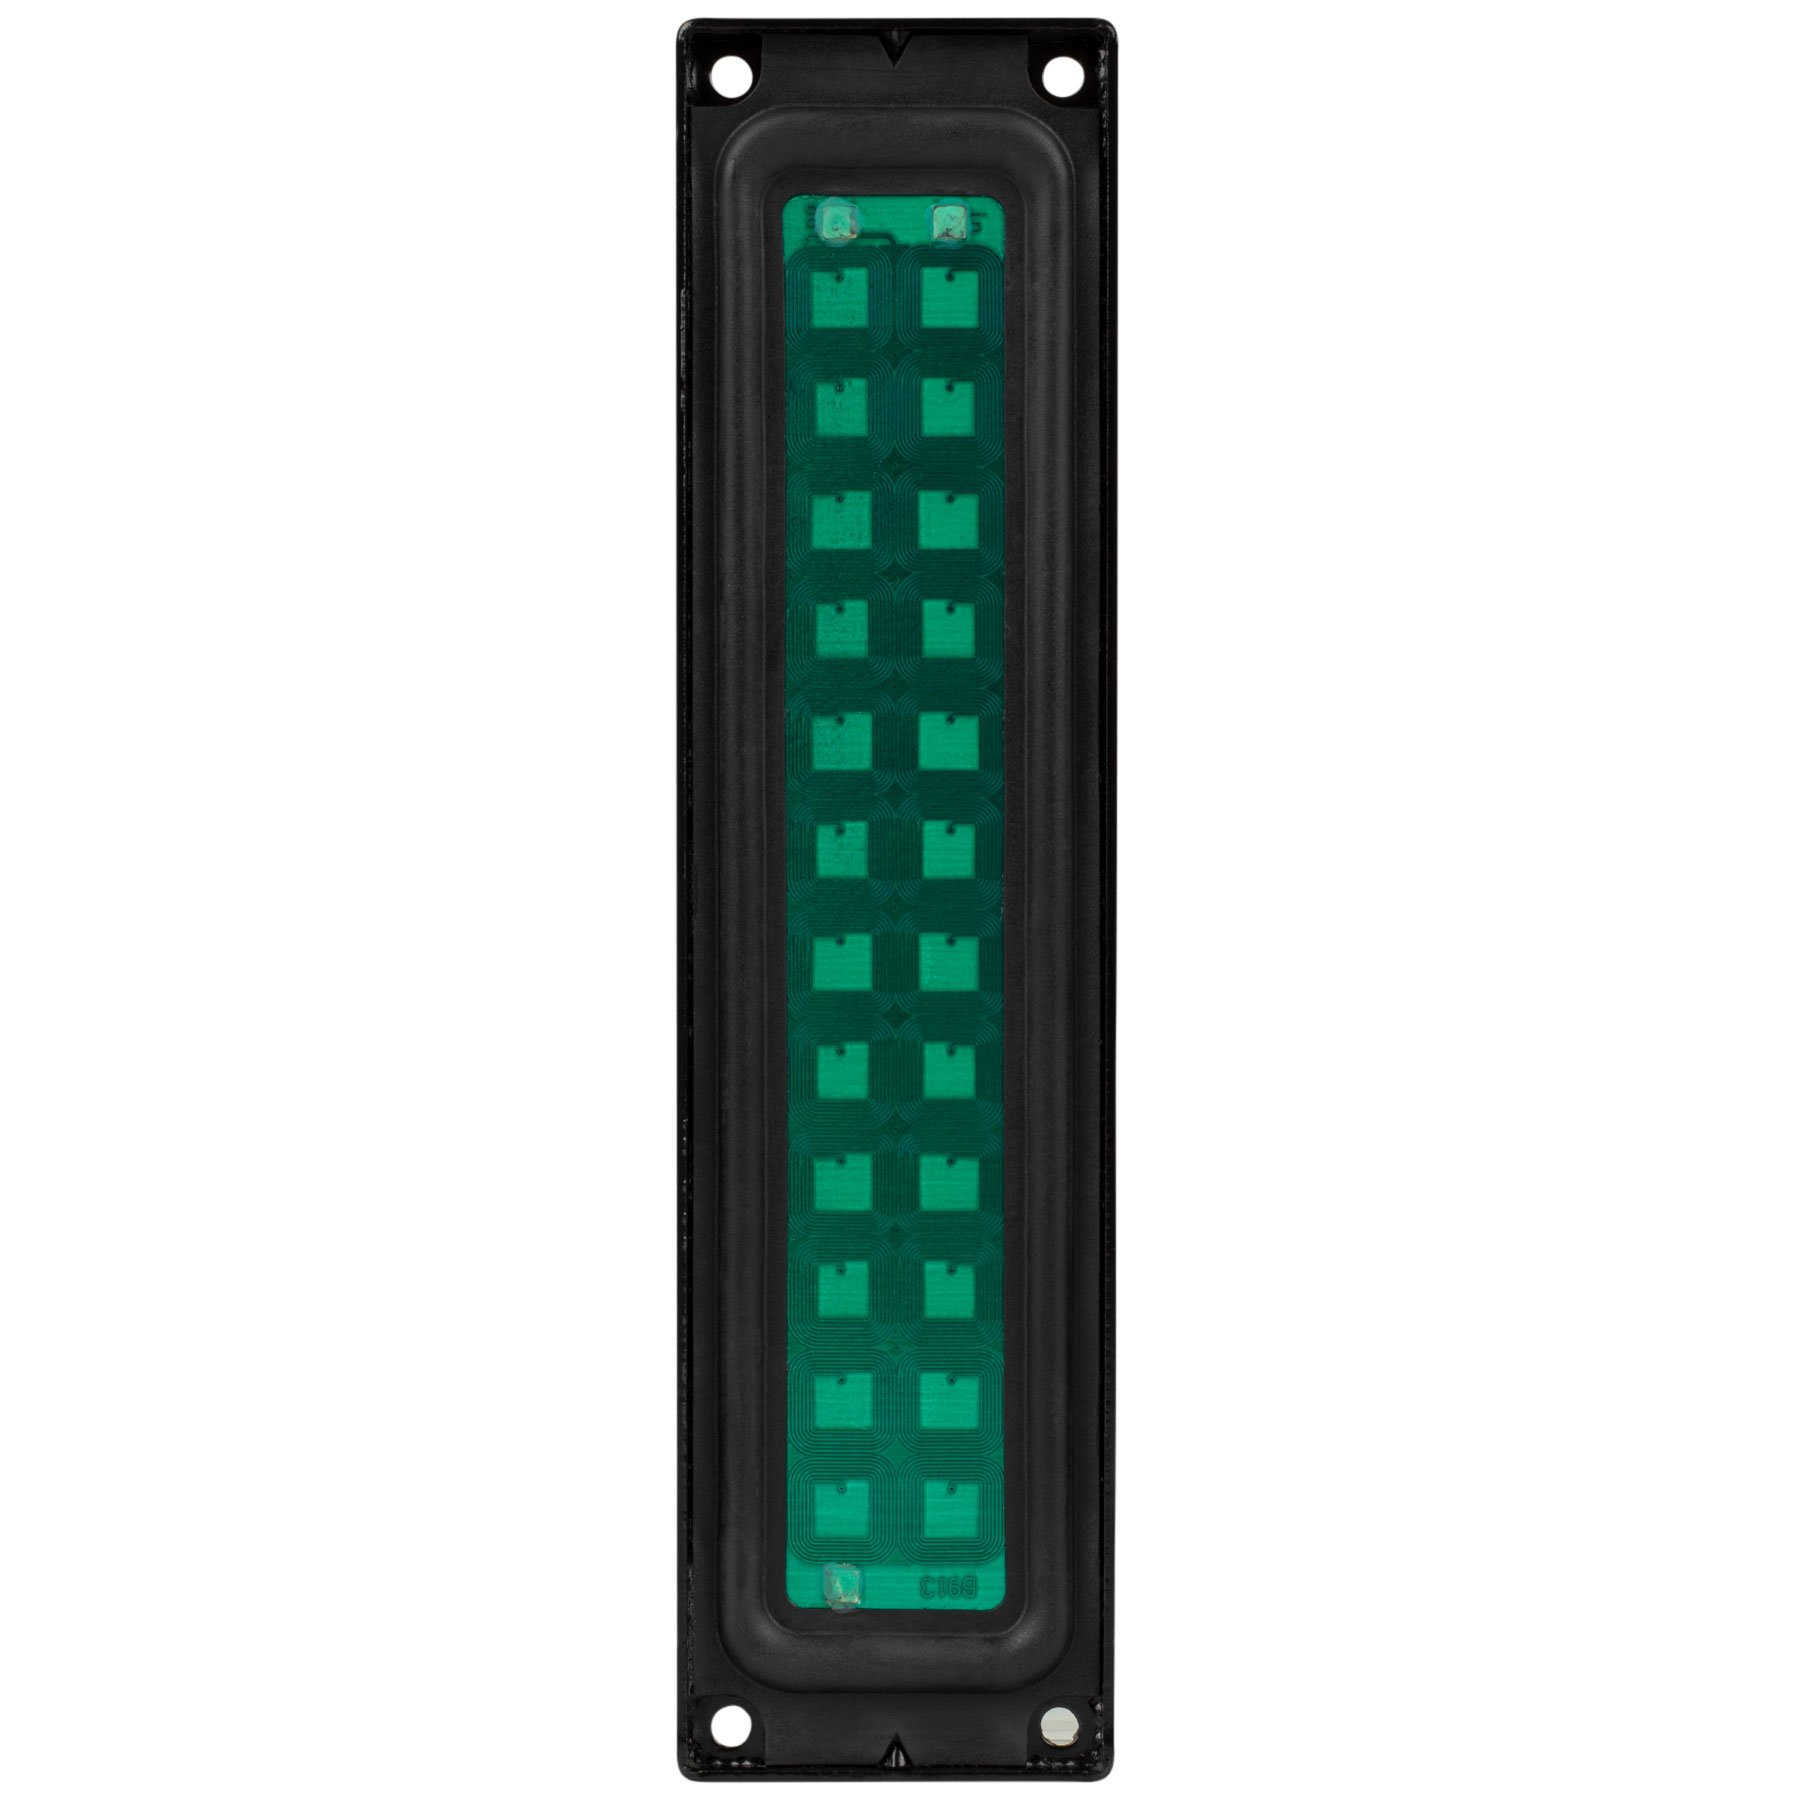 FPS 0212M7R1 OEM 1-9/16 x 6-1/4 Flat Panel MCMA Planar Speaker 6 Ohm 15W